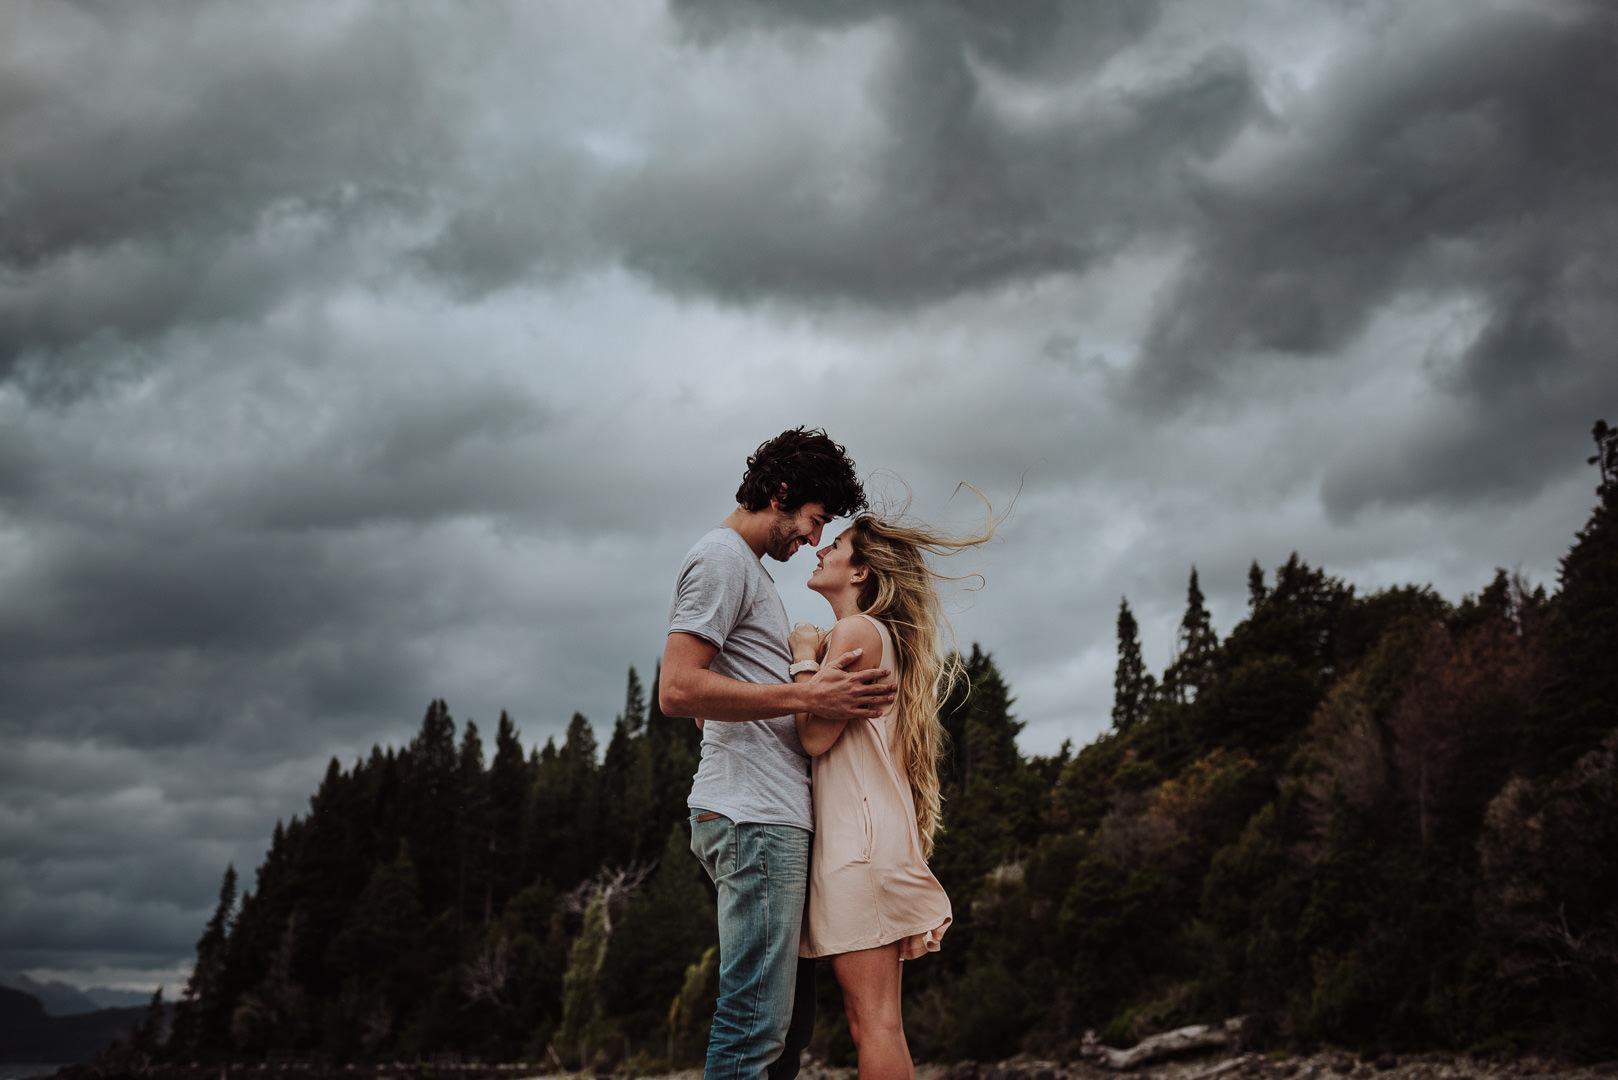 fotógrafo de casamiento villa la angostura